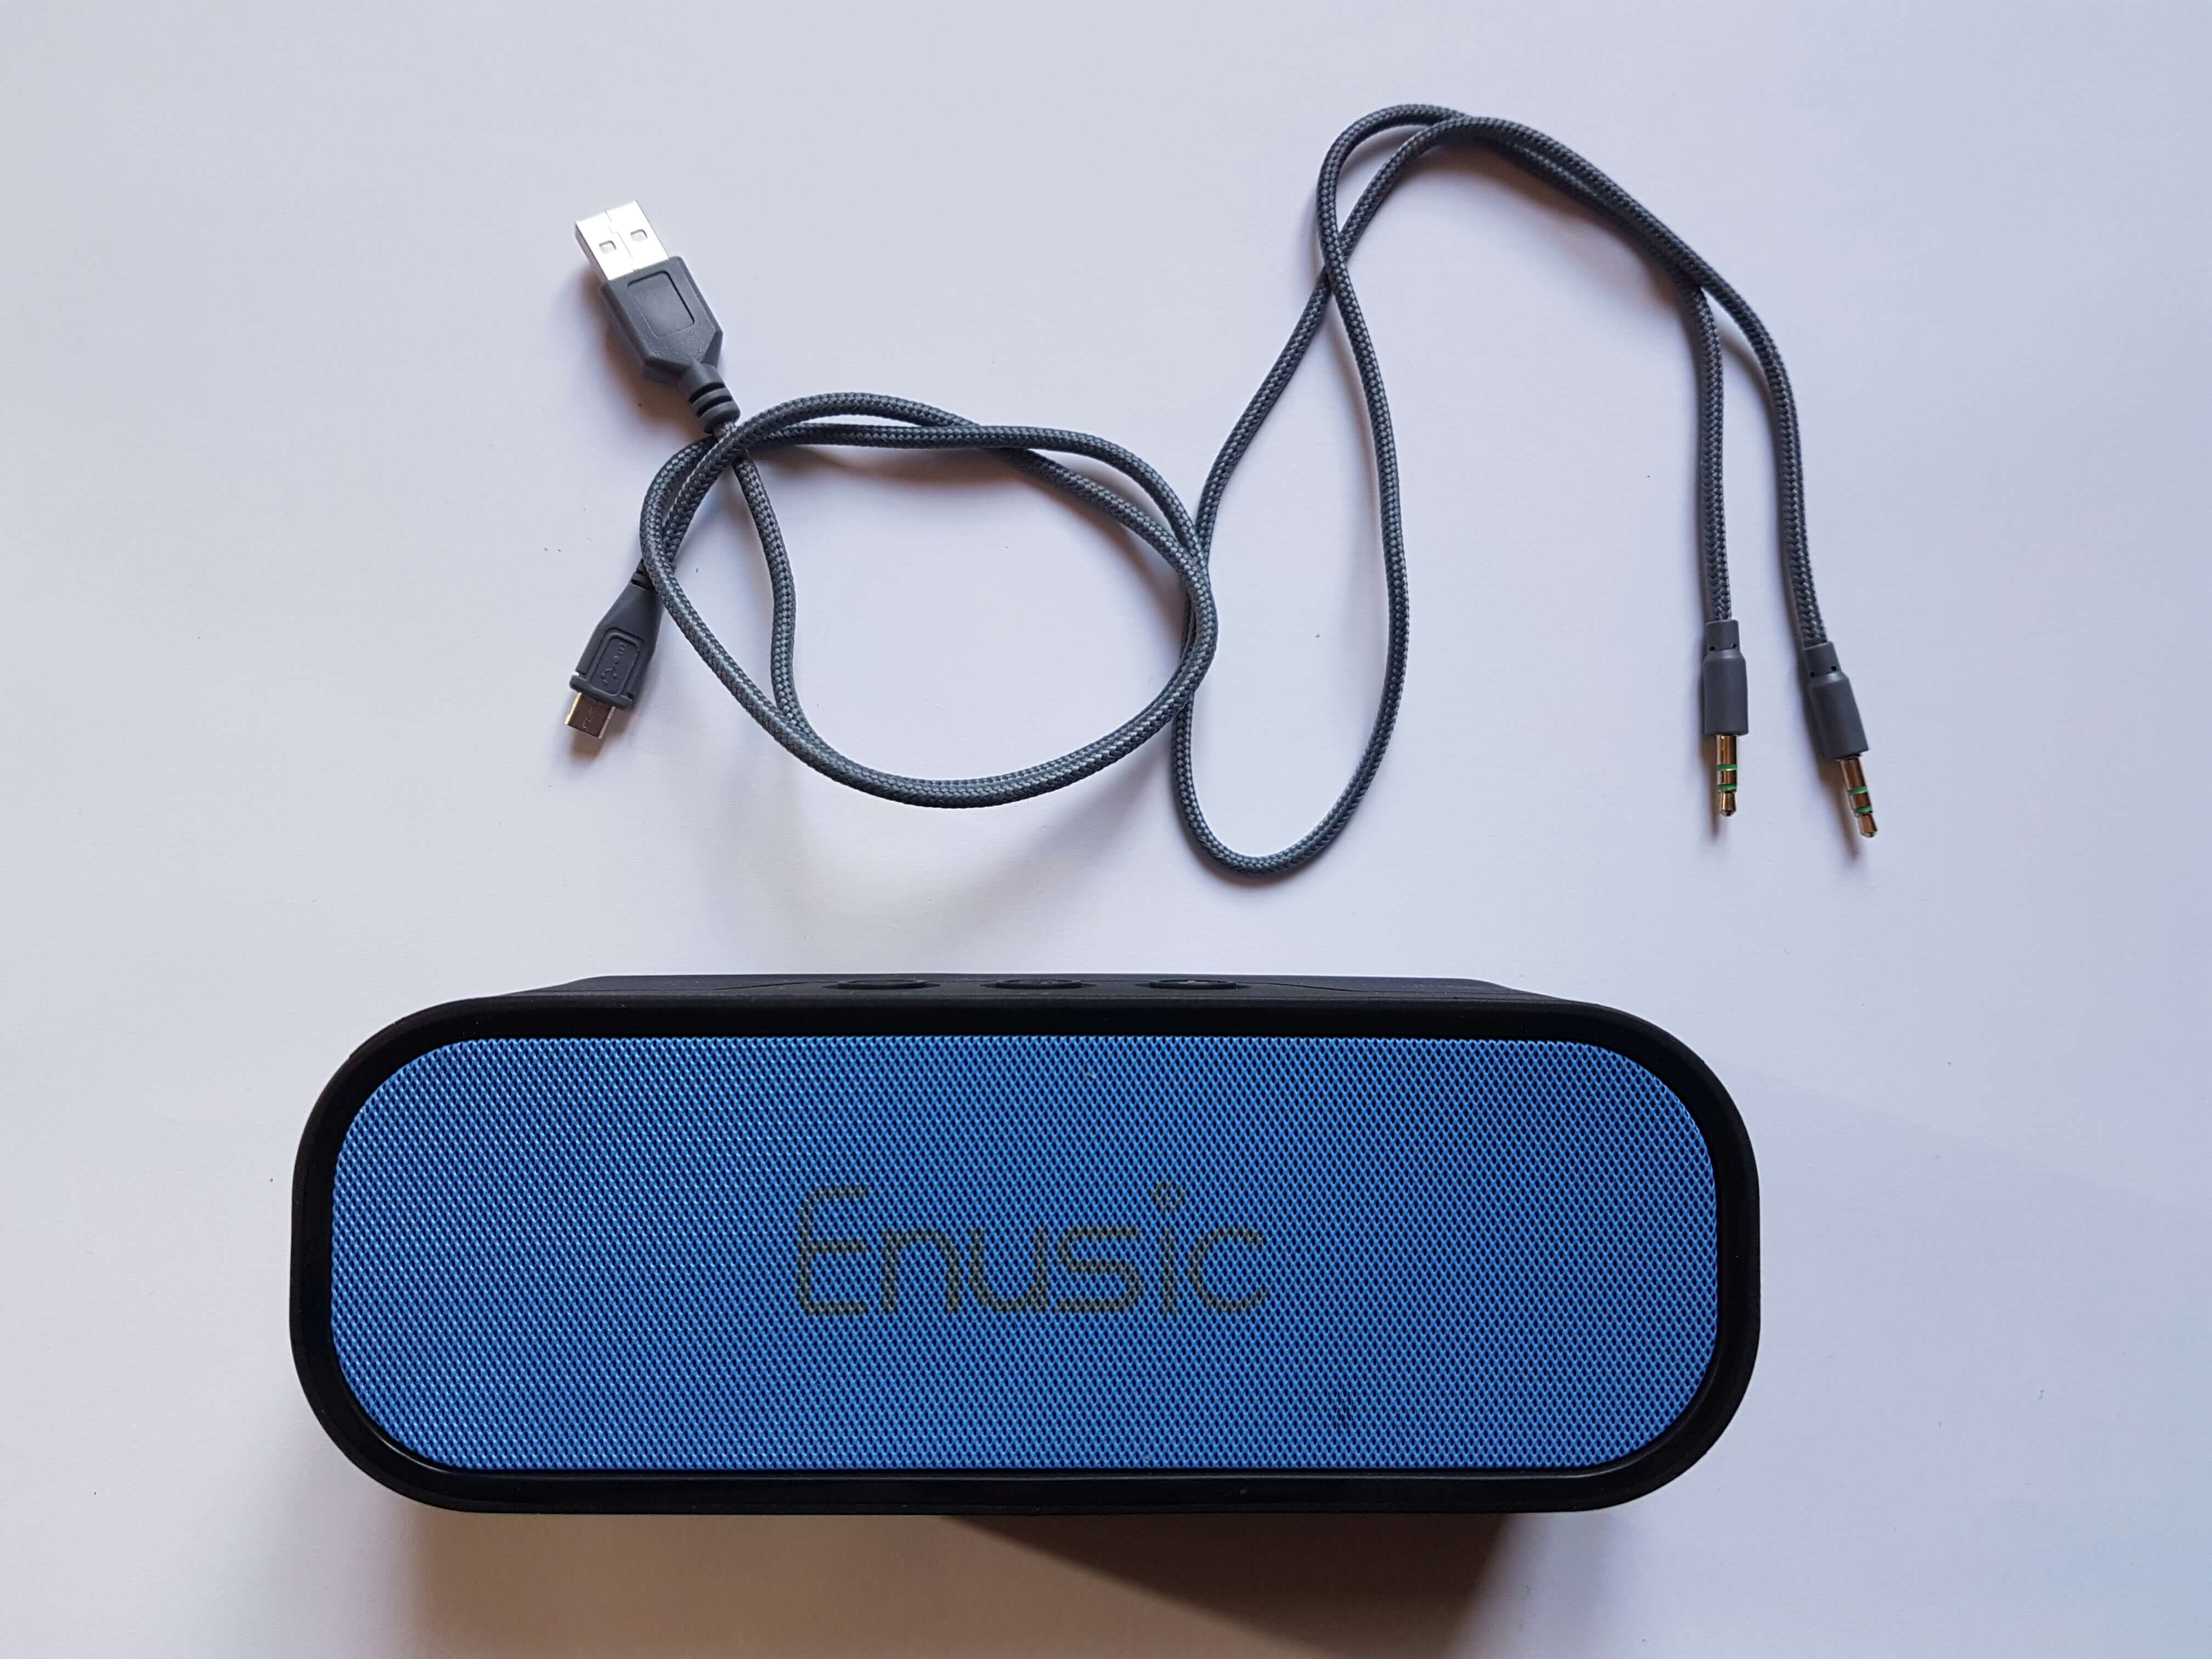 Enceinte portable Enusic Bangood